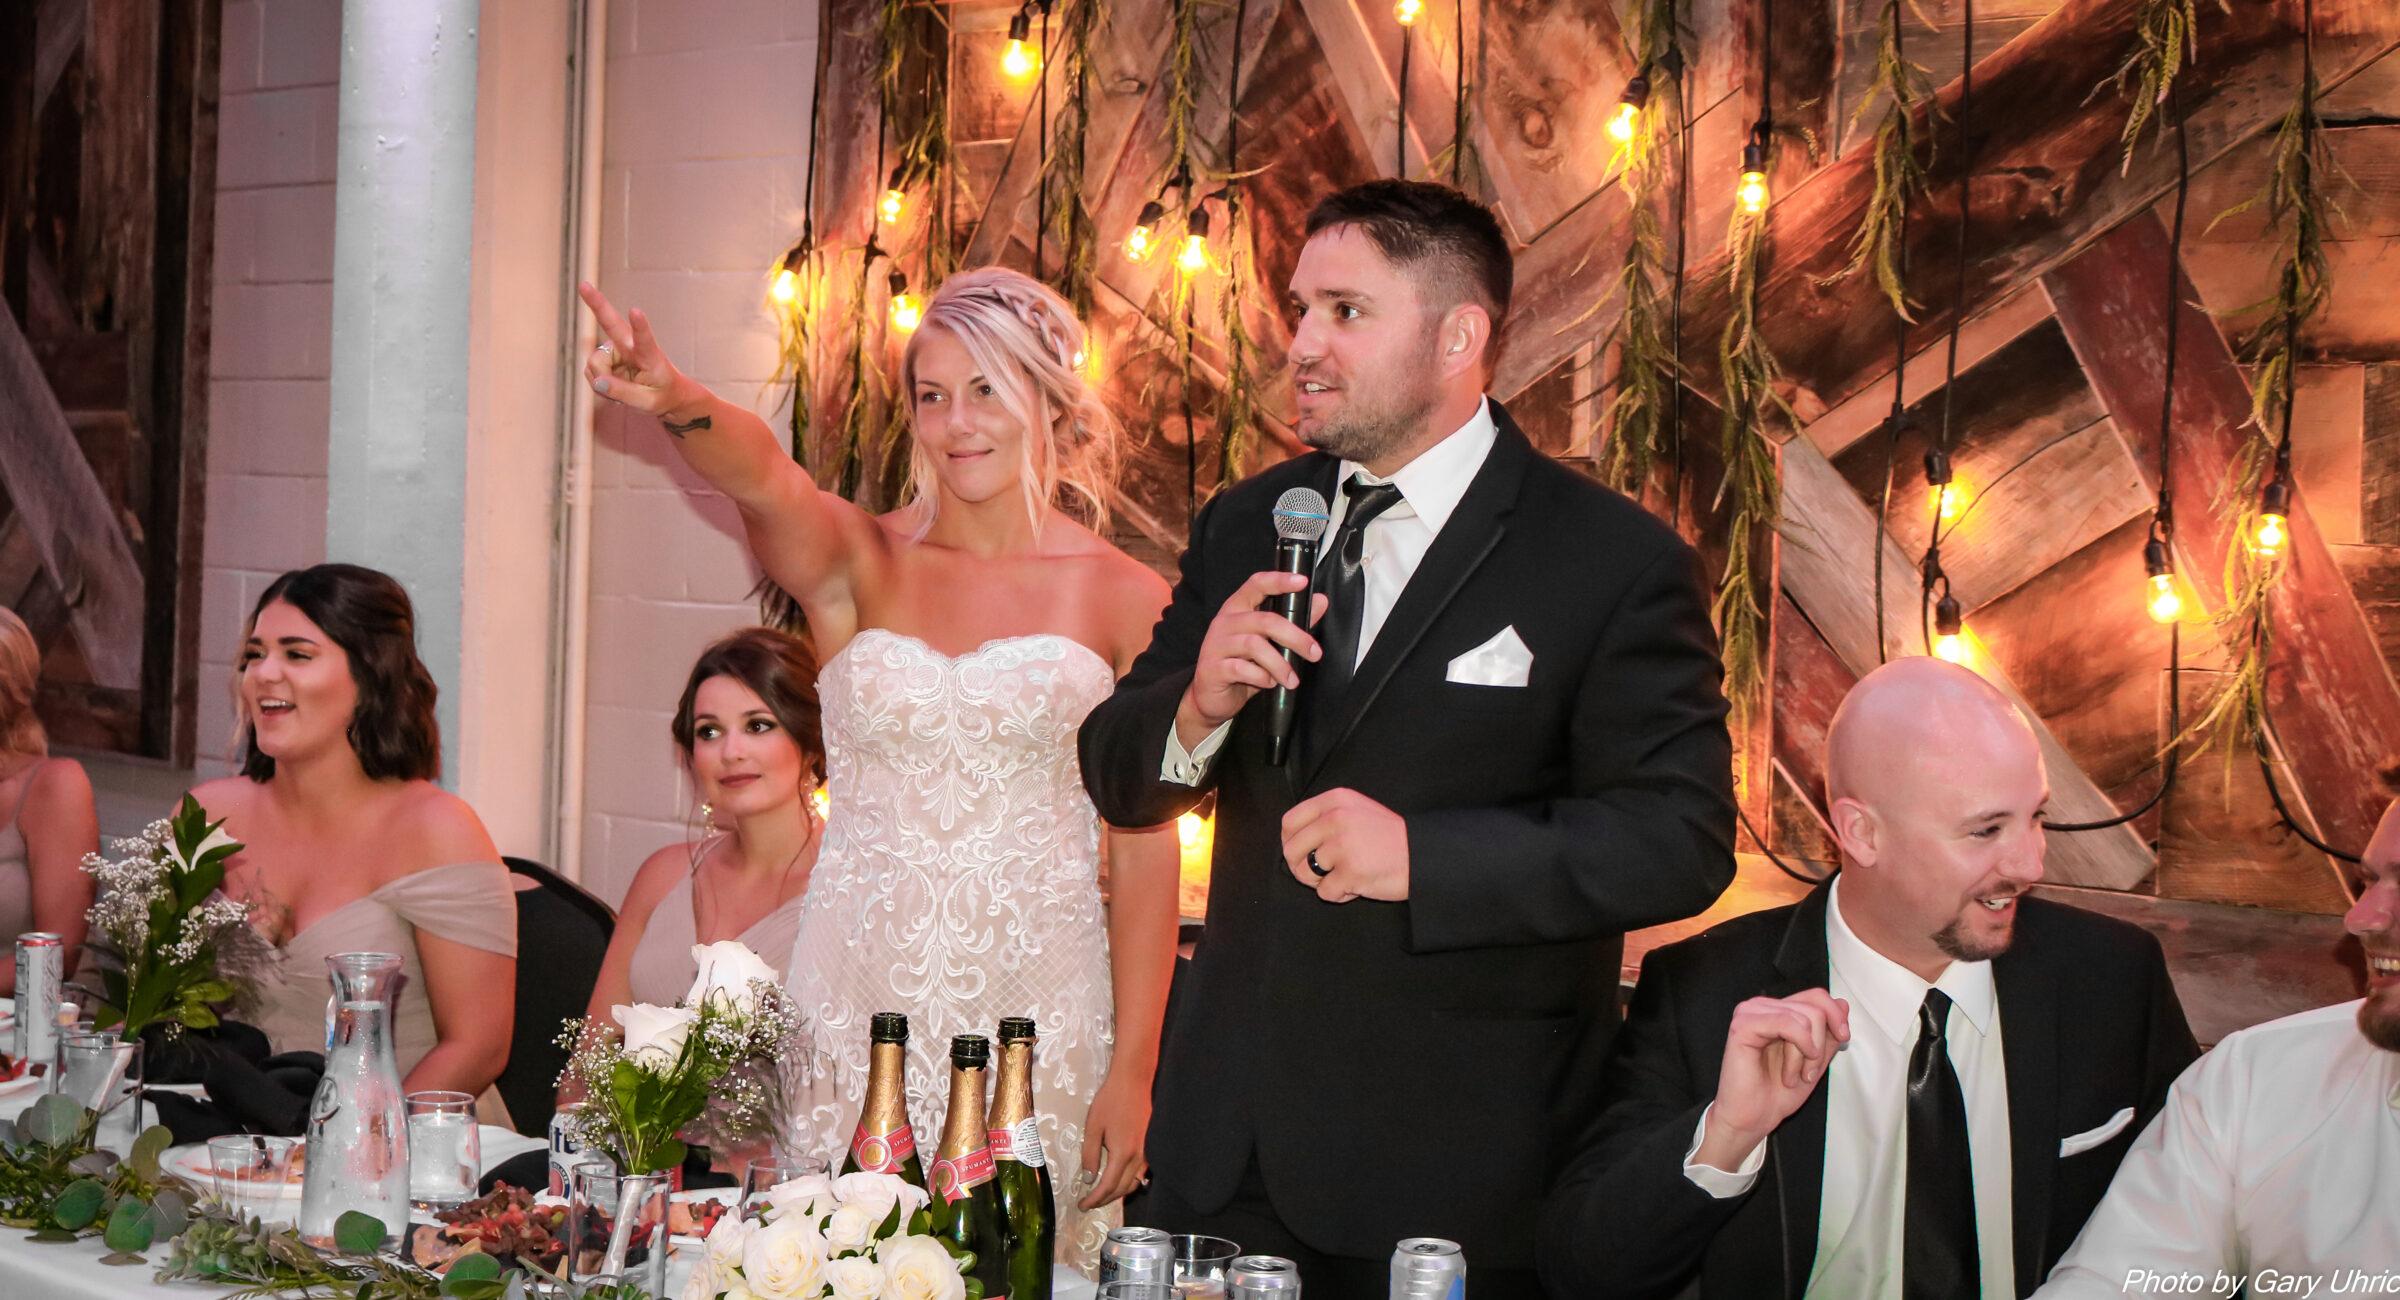 Wedding Speeches Toast Wedding Party Back Drop Market Lights Wedding Dress Tuxedo Weborg 21 Centre Gering Nebraska